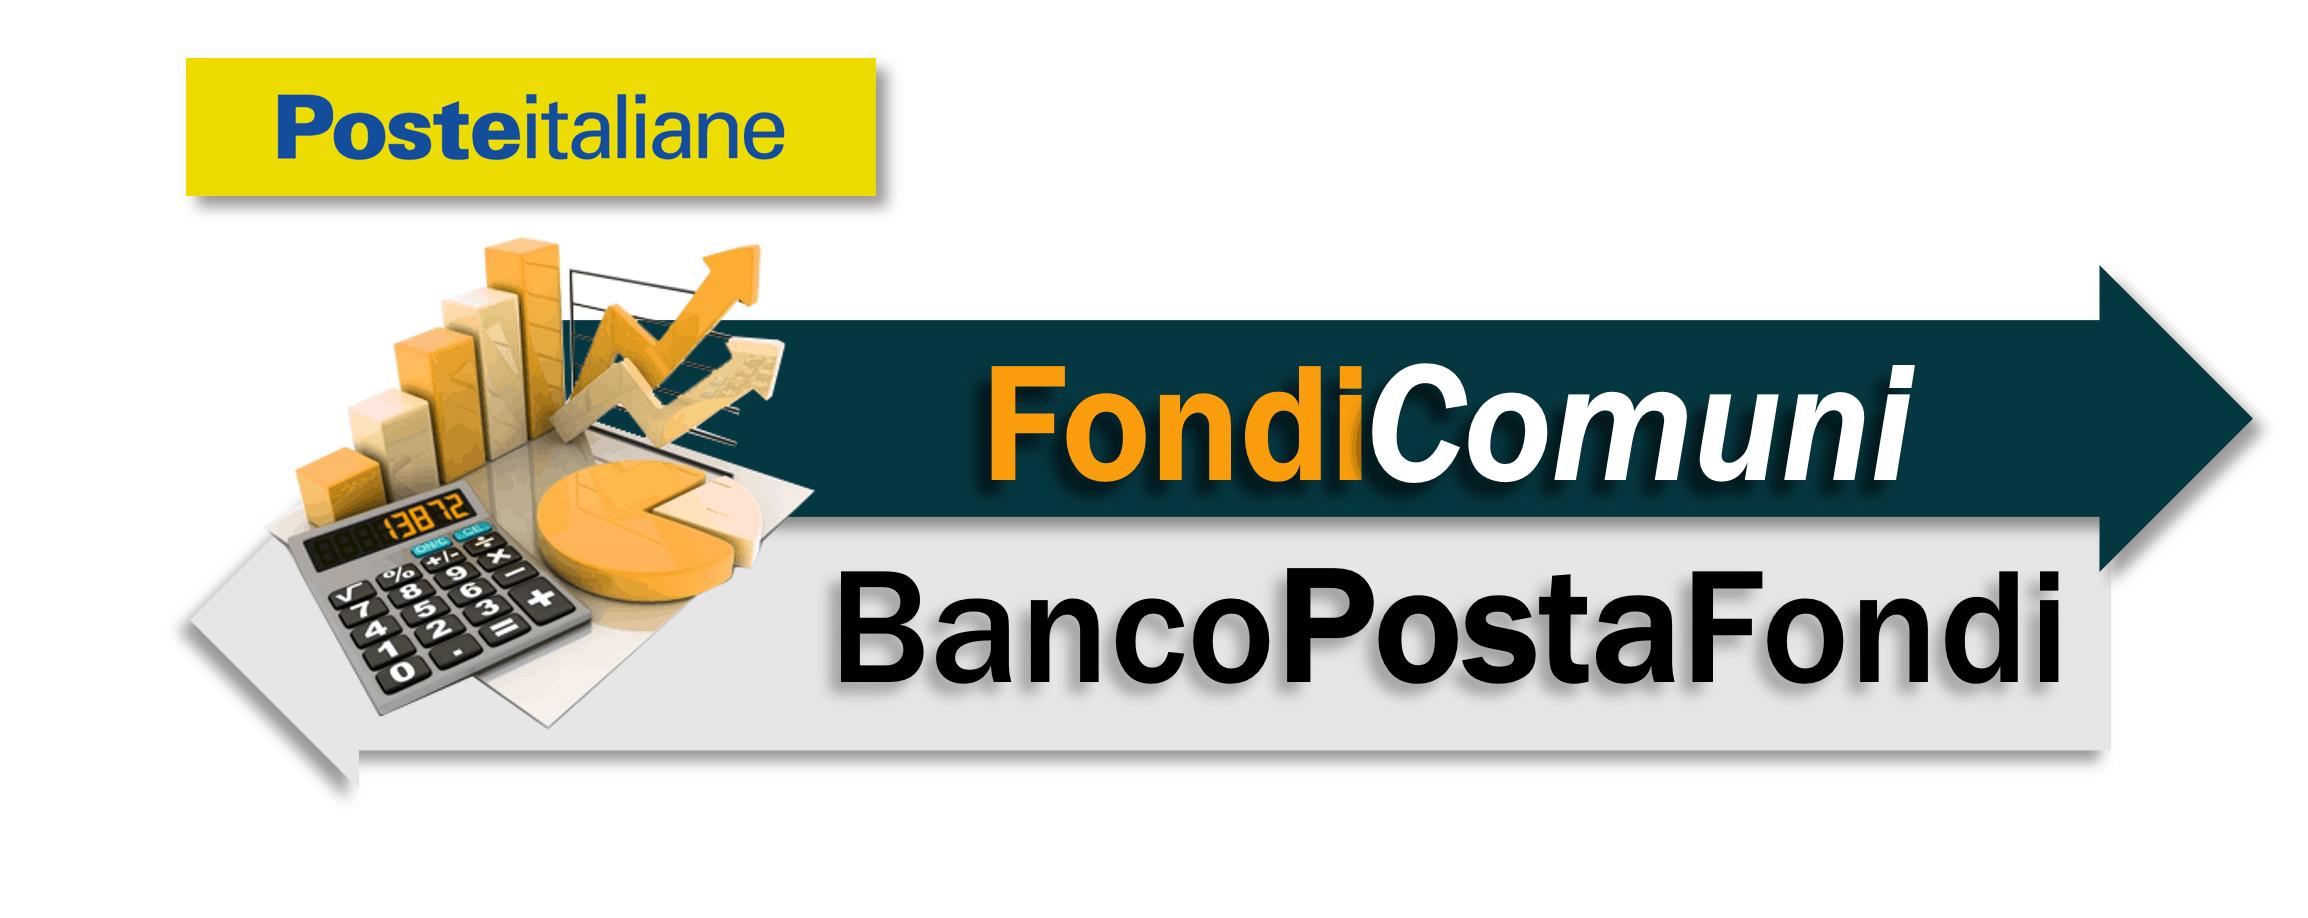 Fondi di investimento BancoPosta: ecco i nuovi fondi targati Eurizon e Anima | BanksAbout